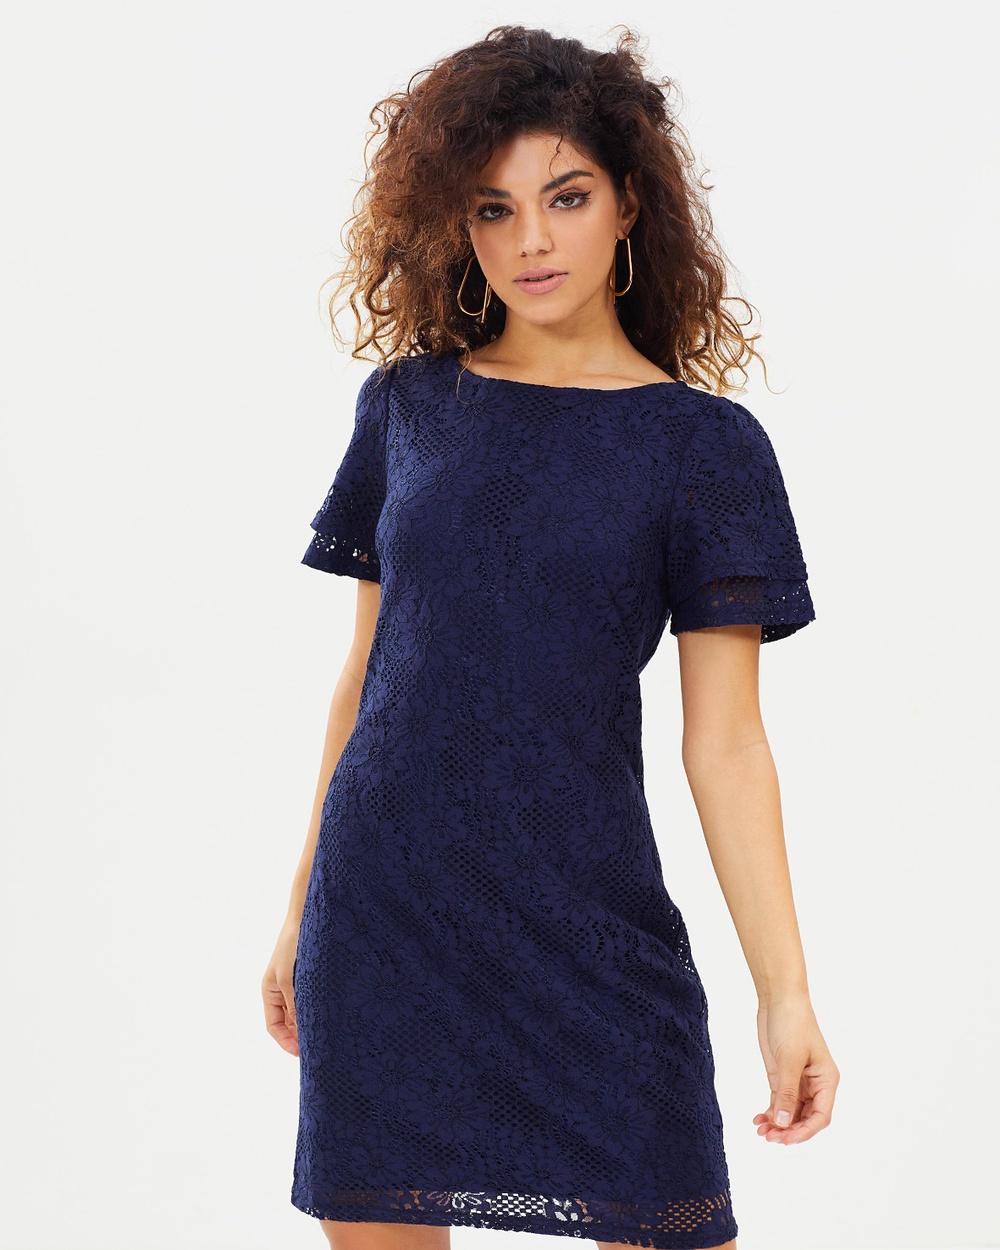 DP Petite Lace Shift Dress Dresses Navy Lace Shift Dress